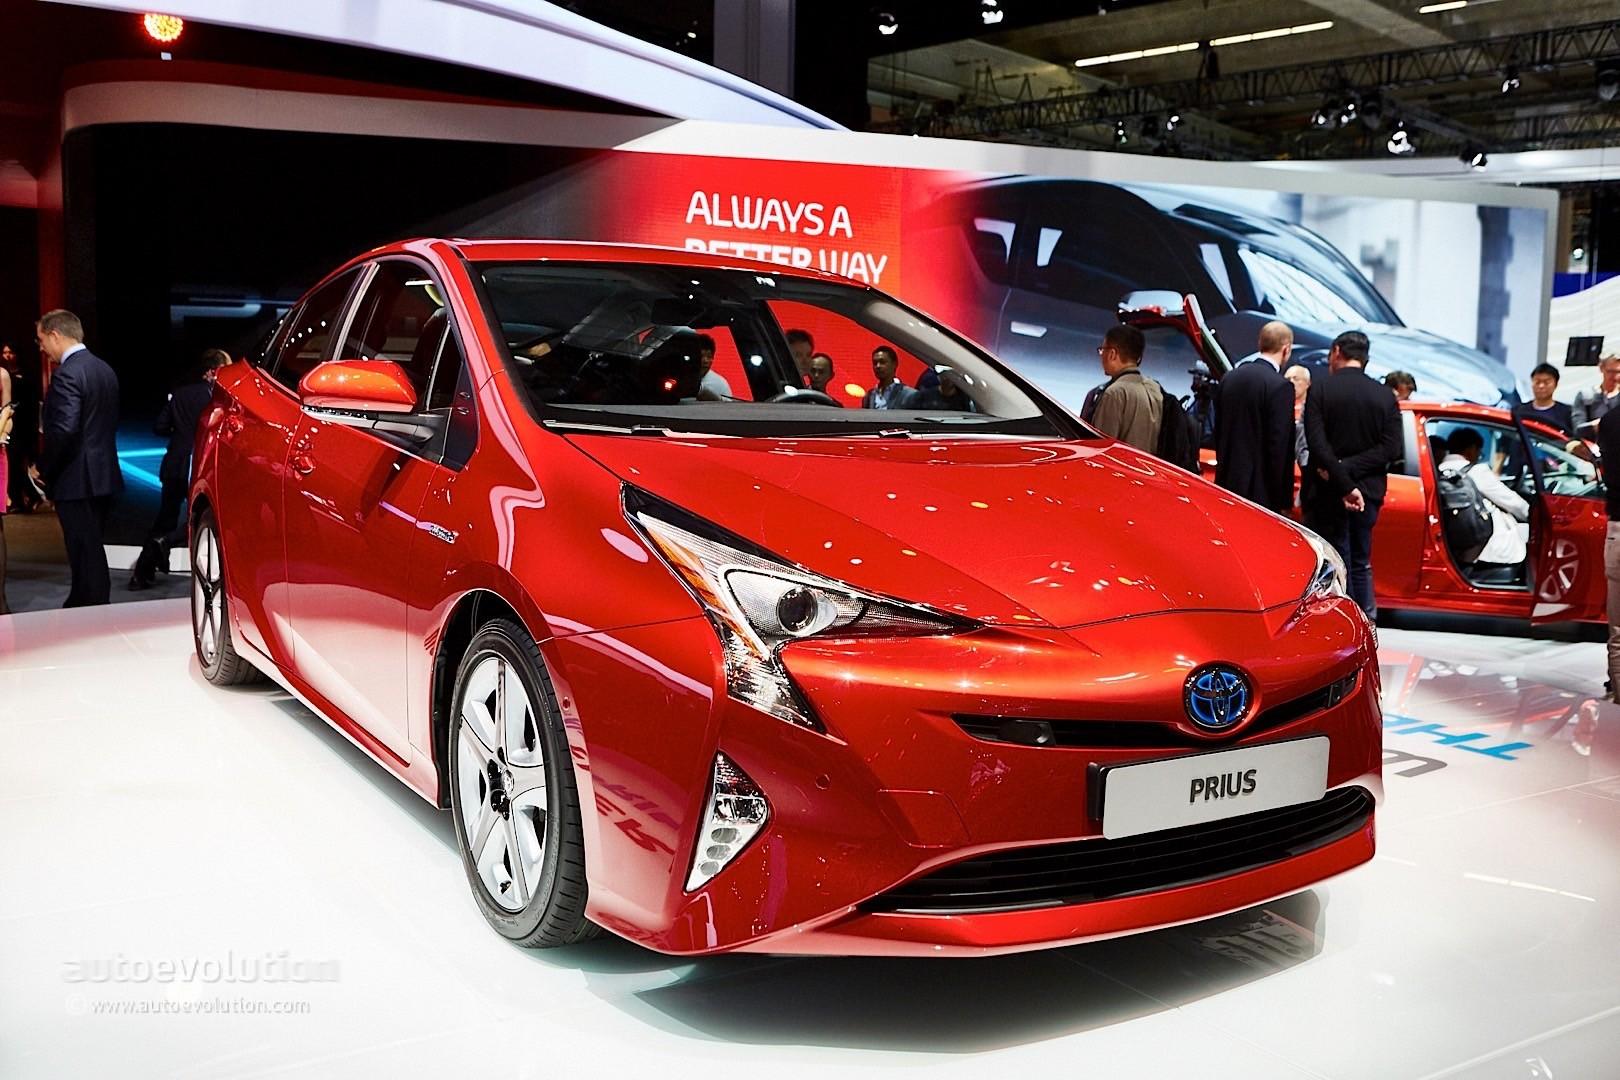 2015 Chevy Trailblazer >> Toyota Prius Recalled Over Parking Brake Problem. Yes, the New Prius! - autoevolution